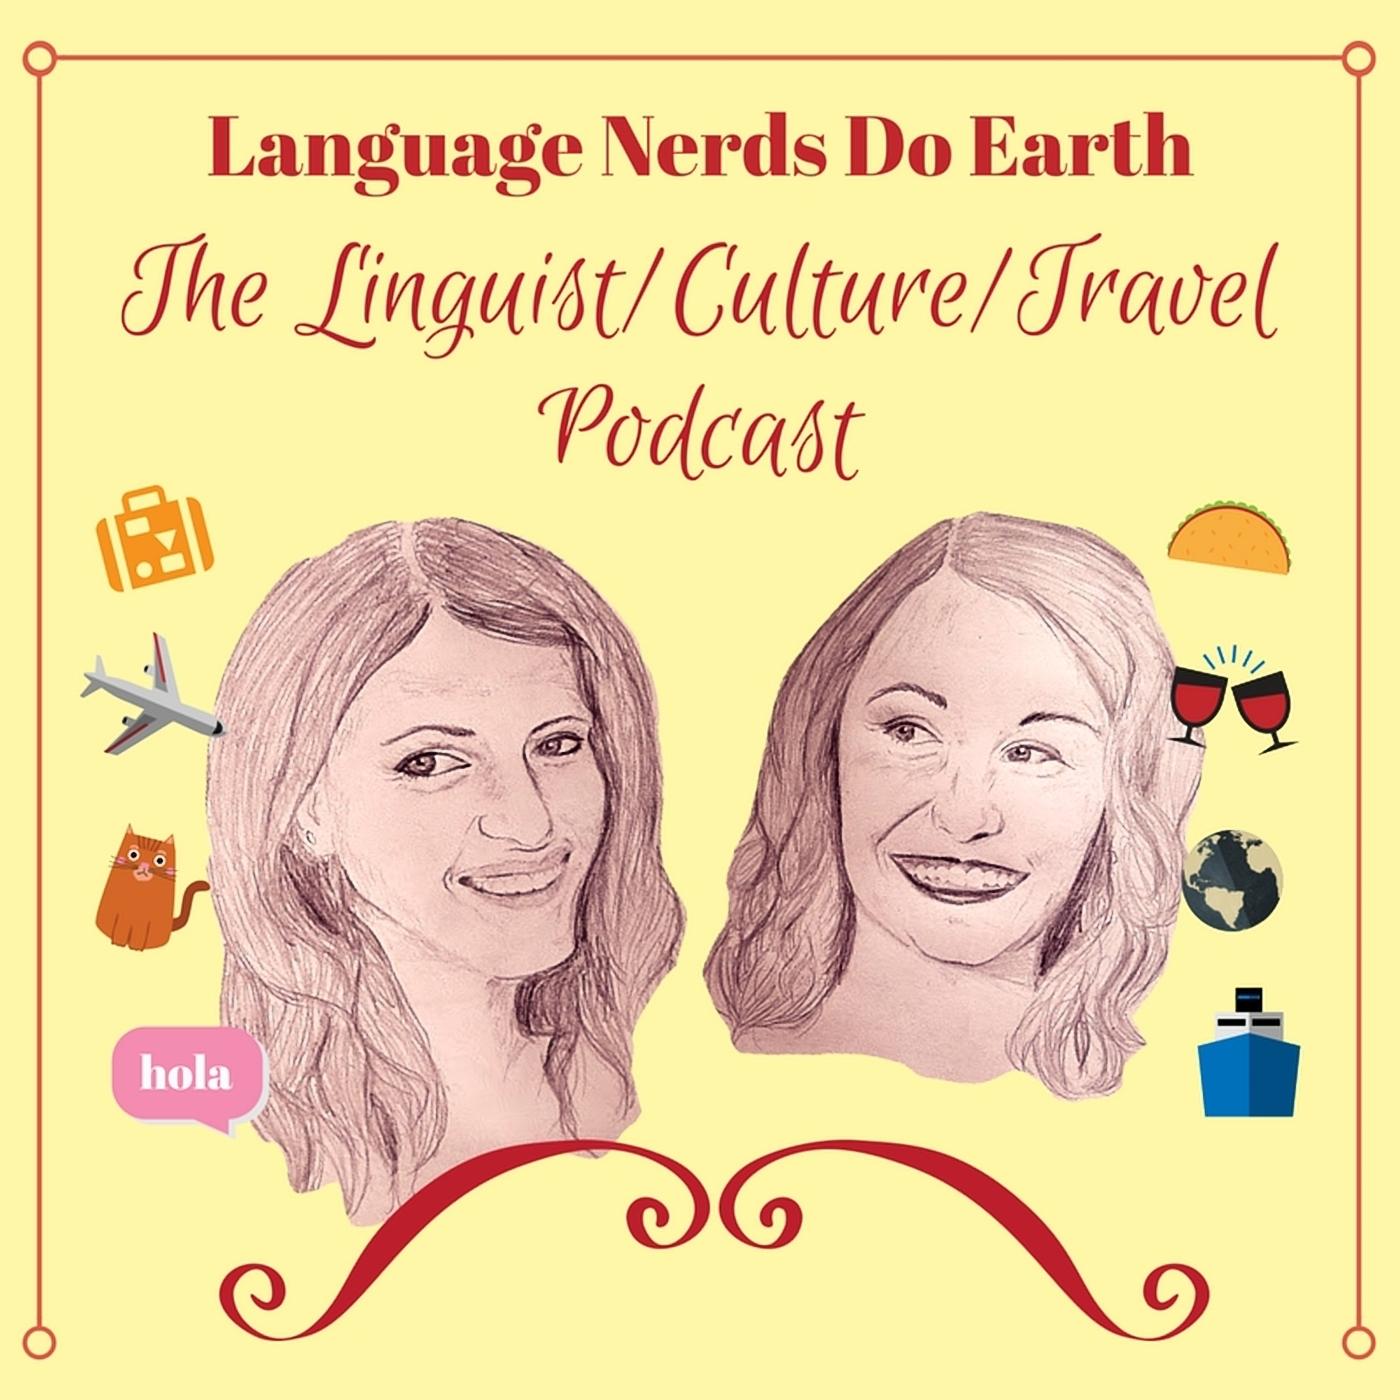 Language Nerds Do Earth